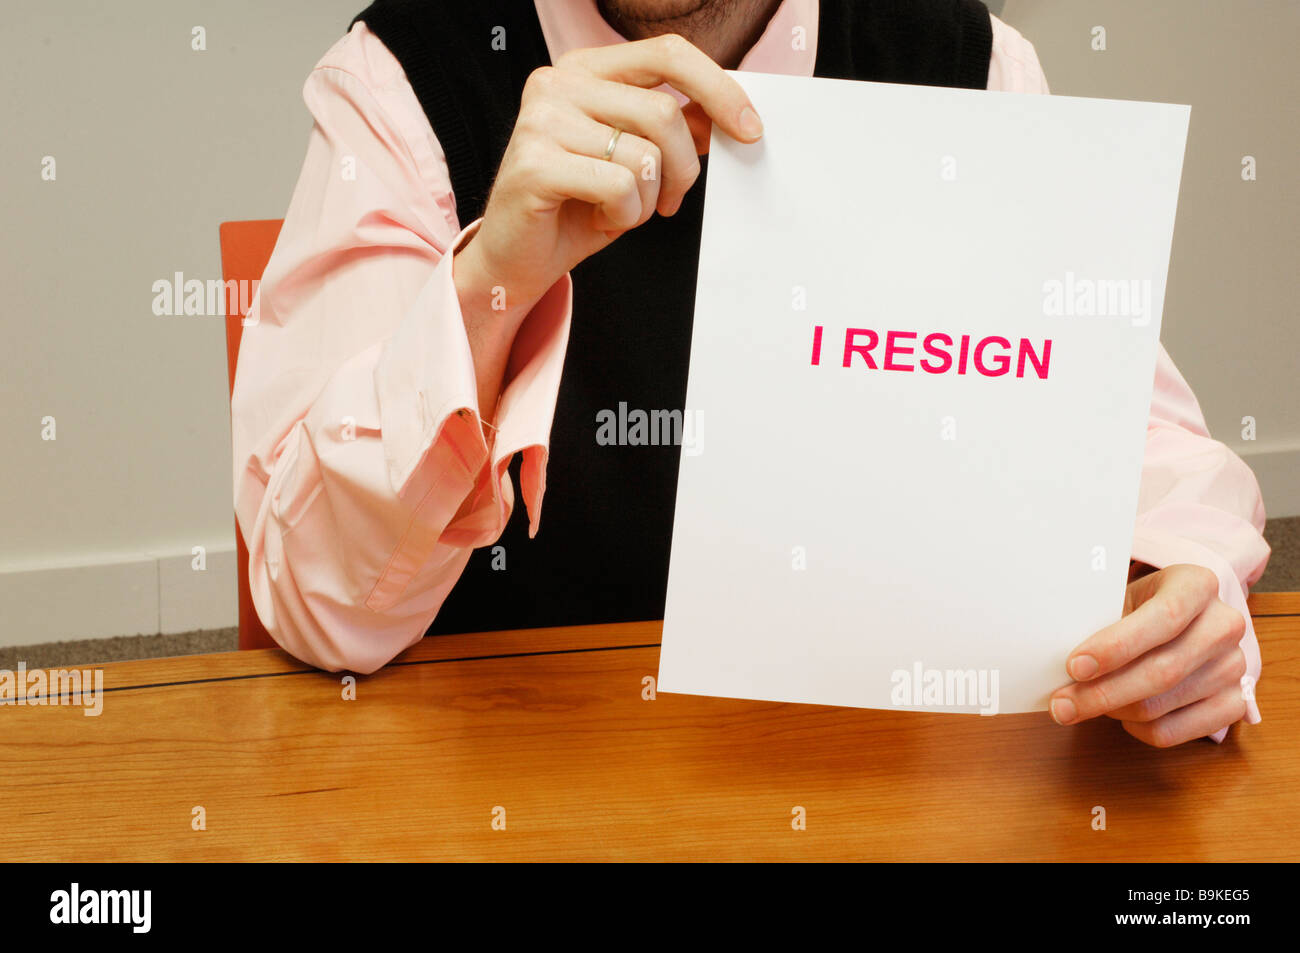 detail of businessman sitting at desk holding resign document - Stock Image